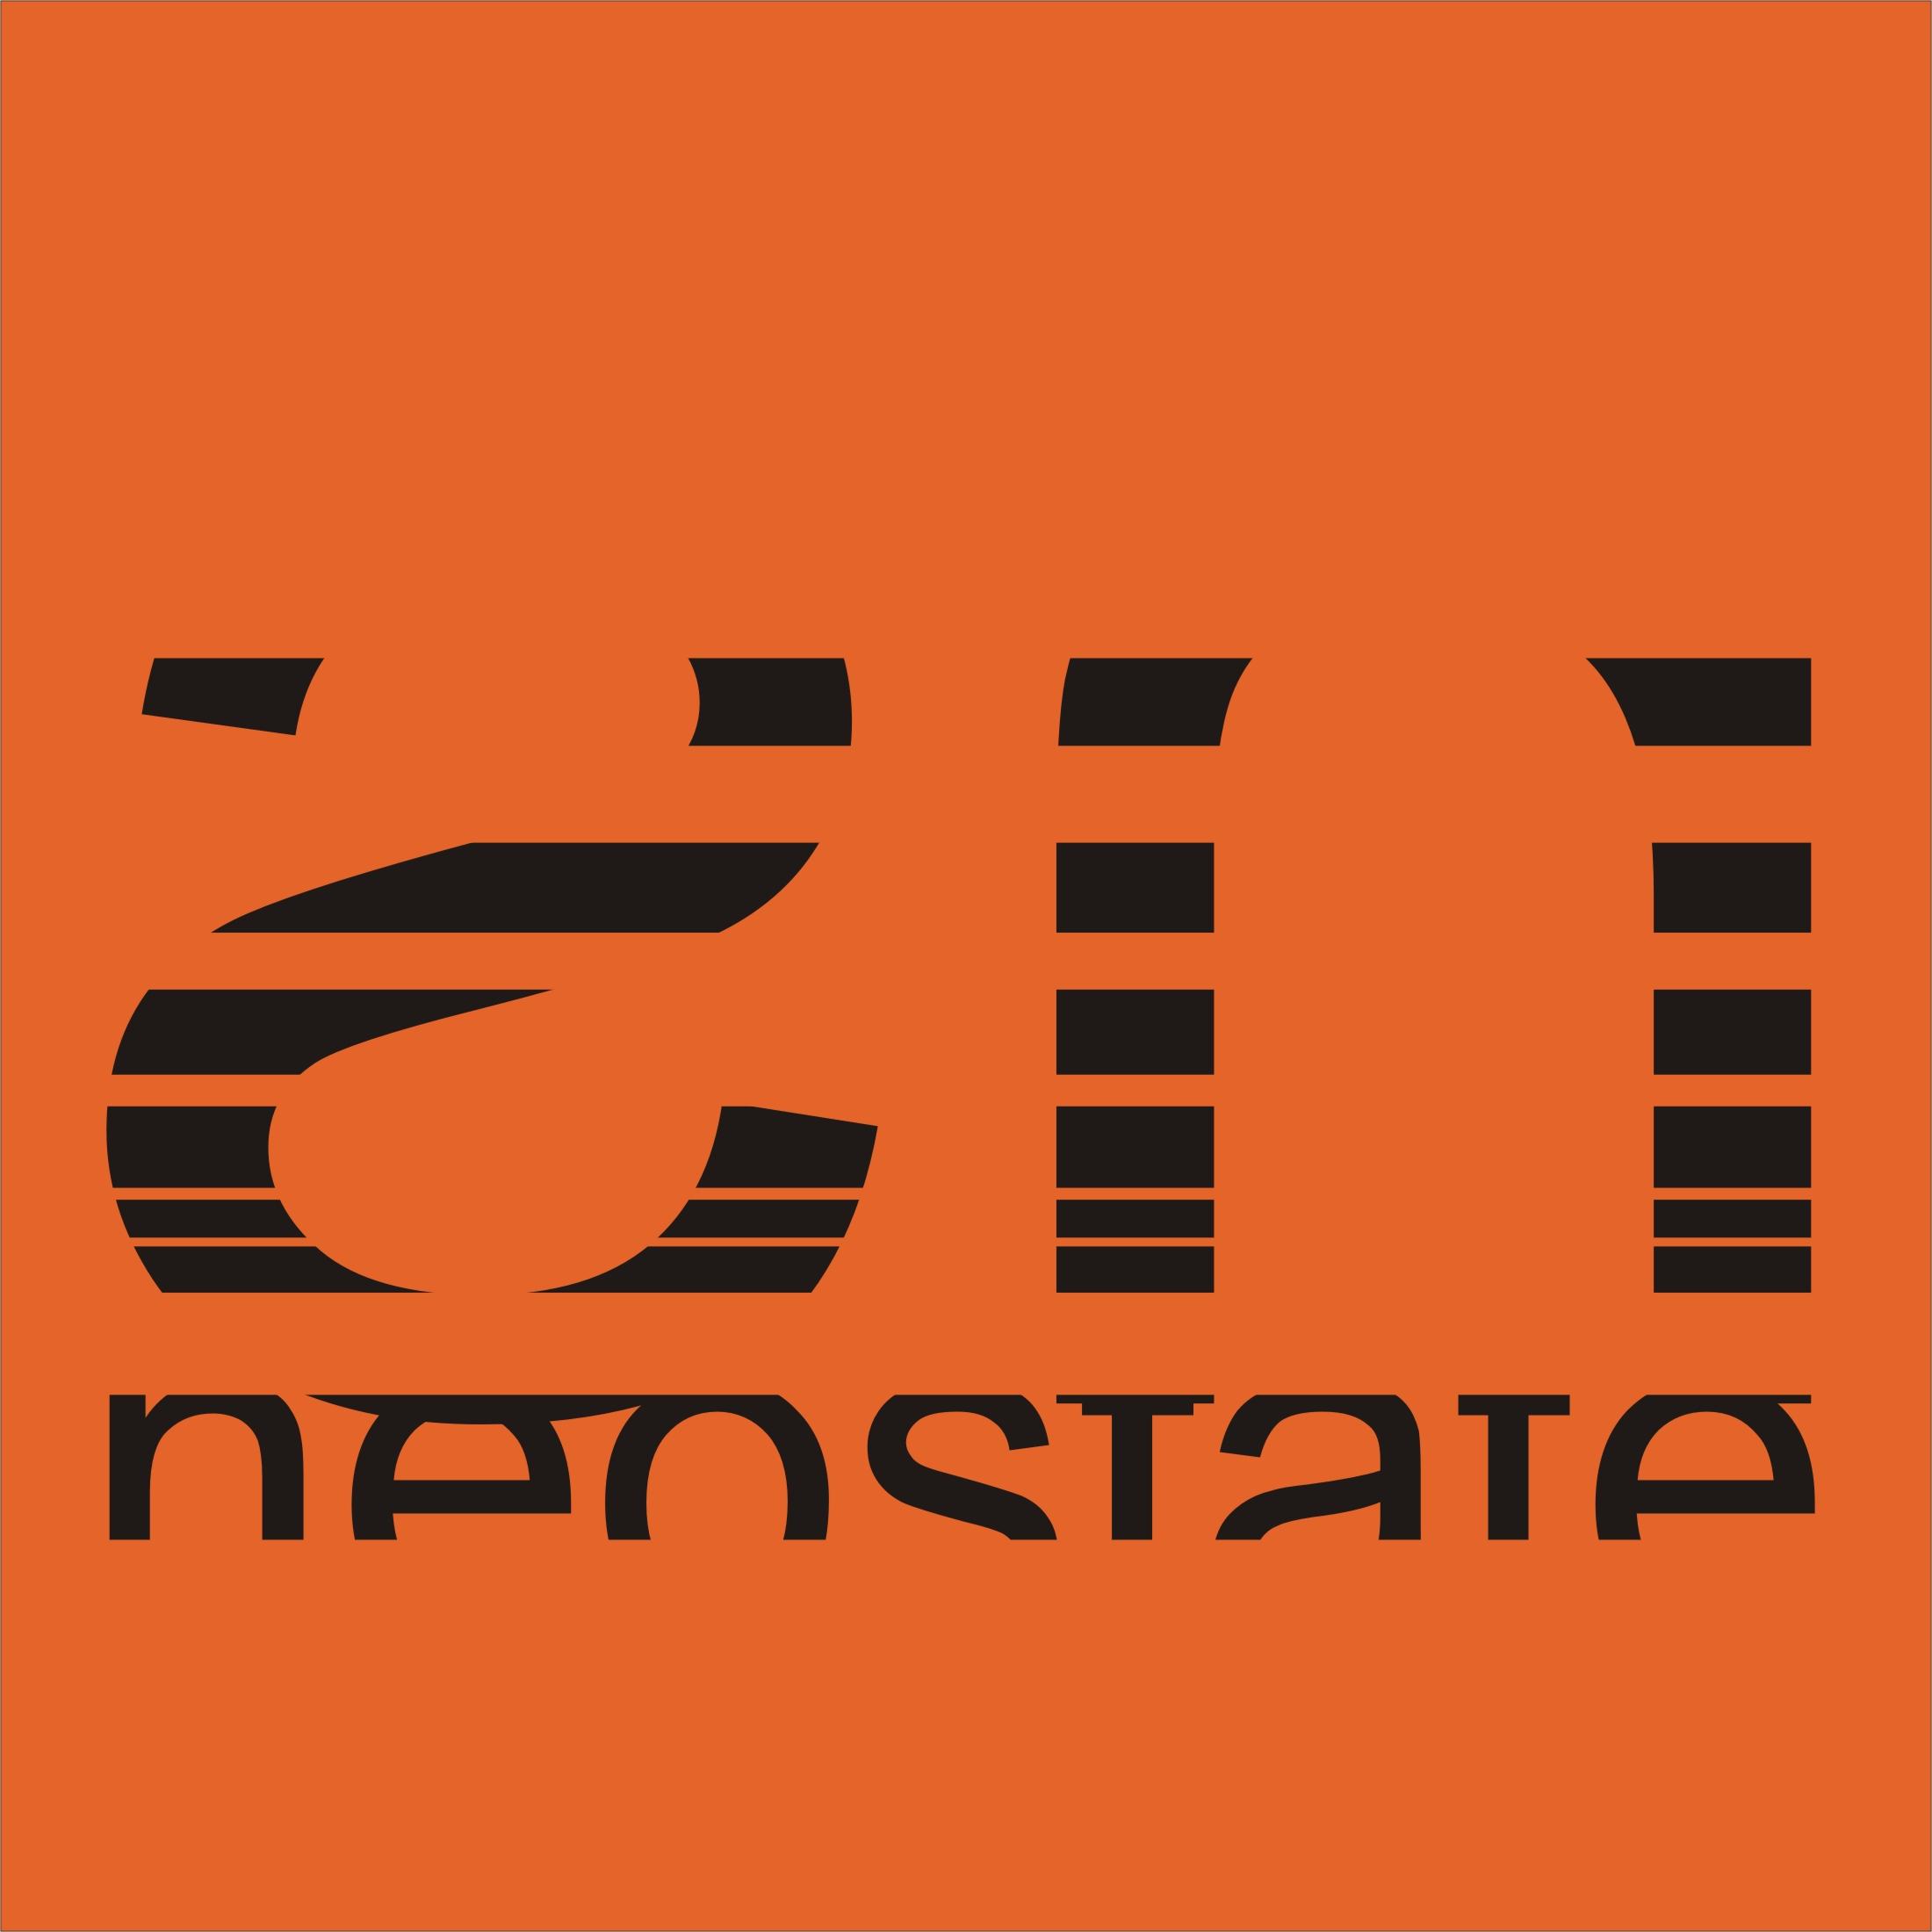 logo neostate